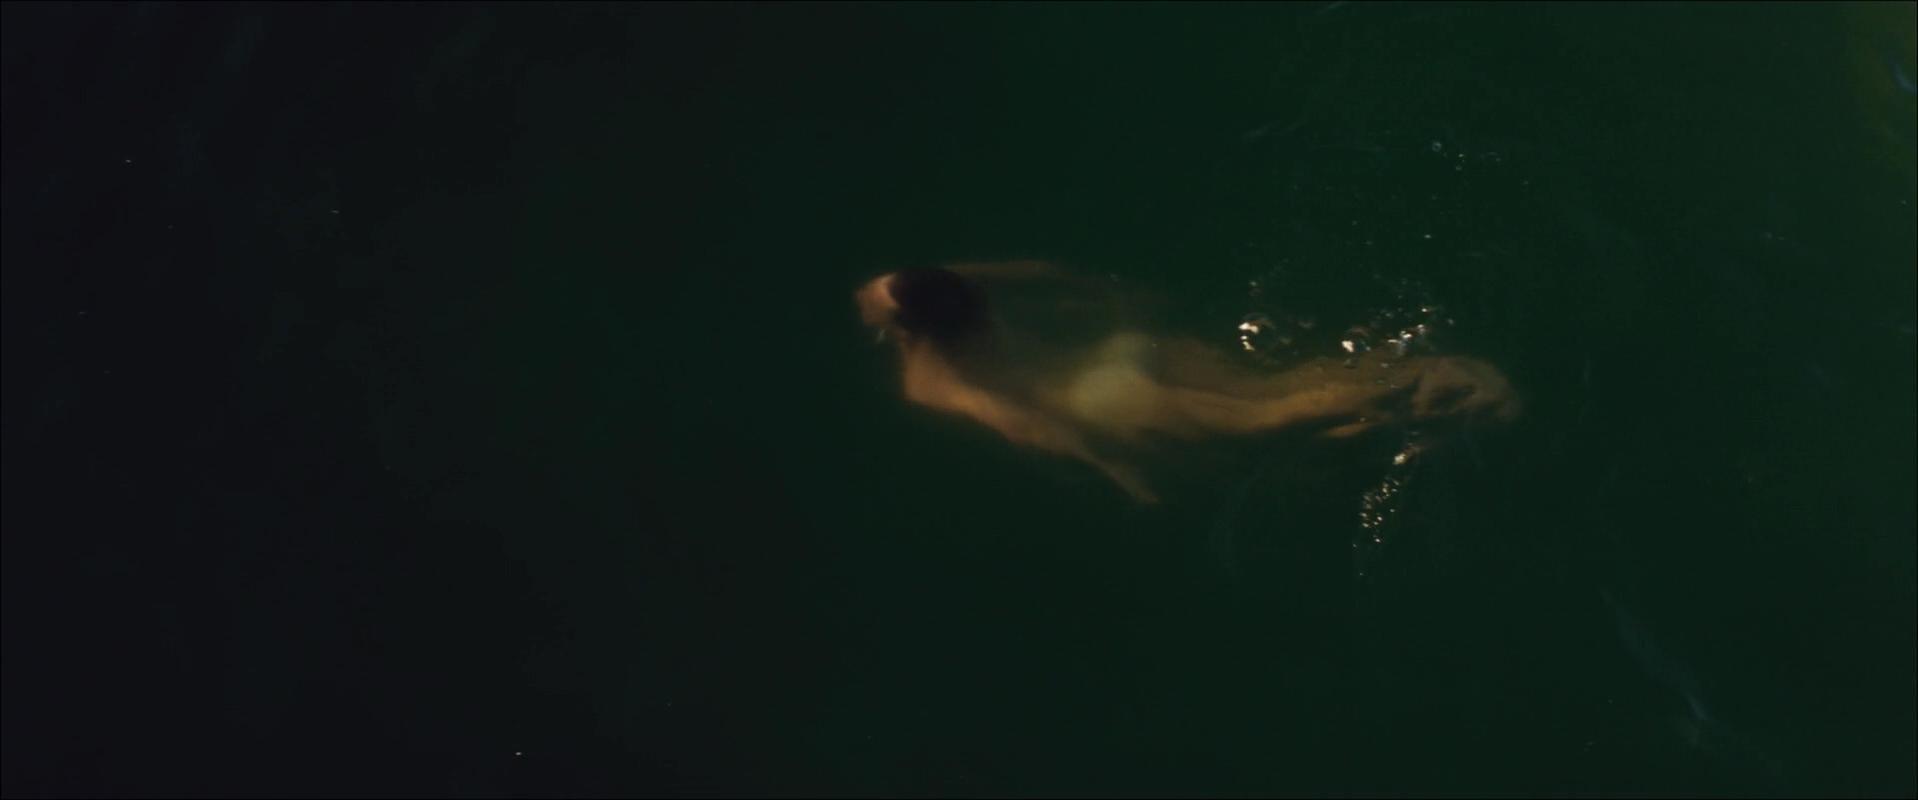 Mia Wasikowska nude - Tracks (2013)